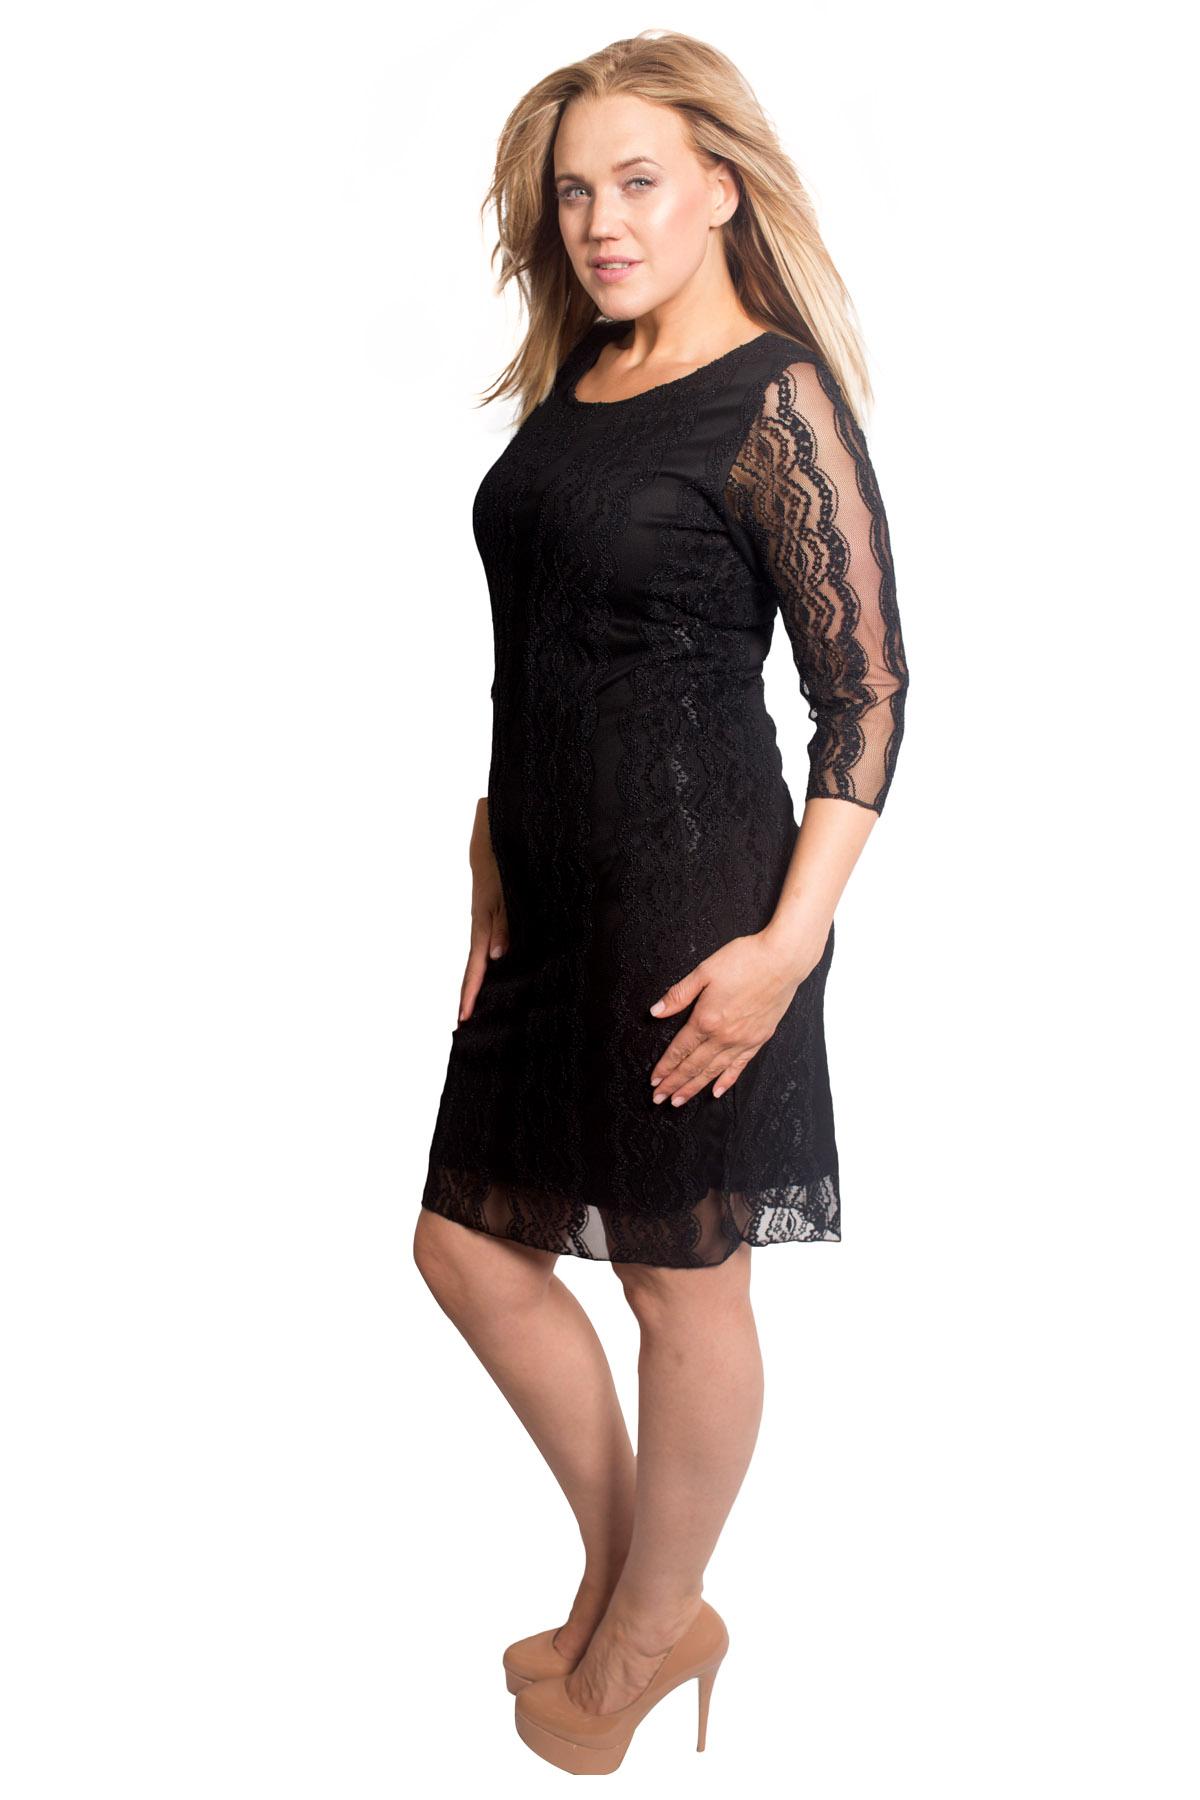 Neu Damen Übergröße Kleid Frau Spitze Krause Bodycon 3//4 Hülsen Midi Nouvelle